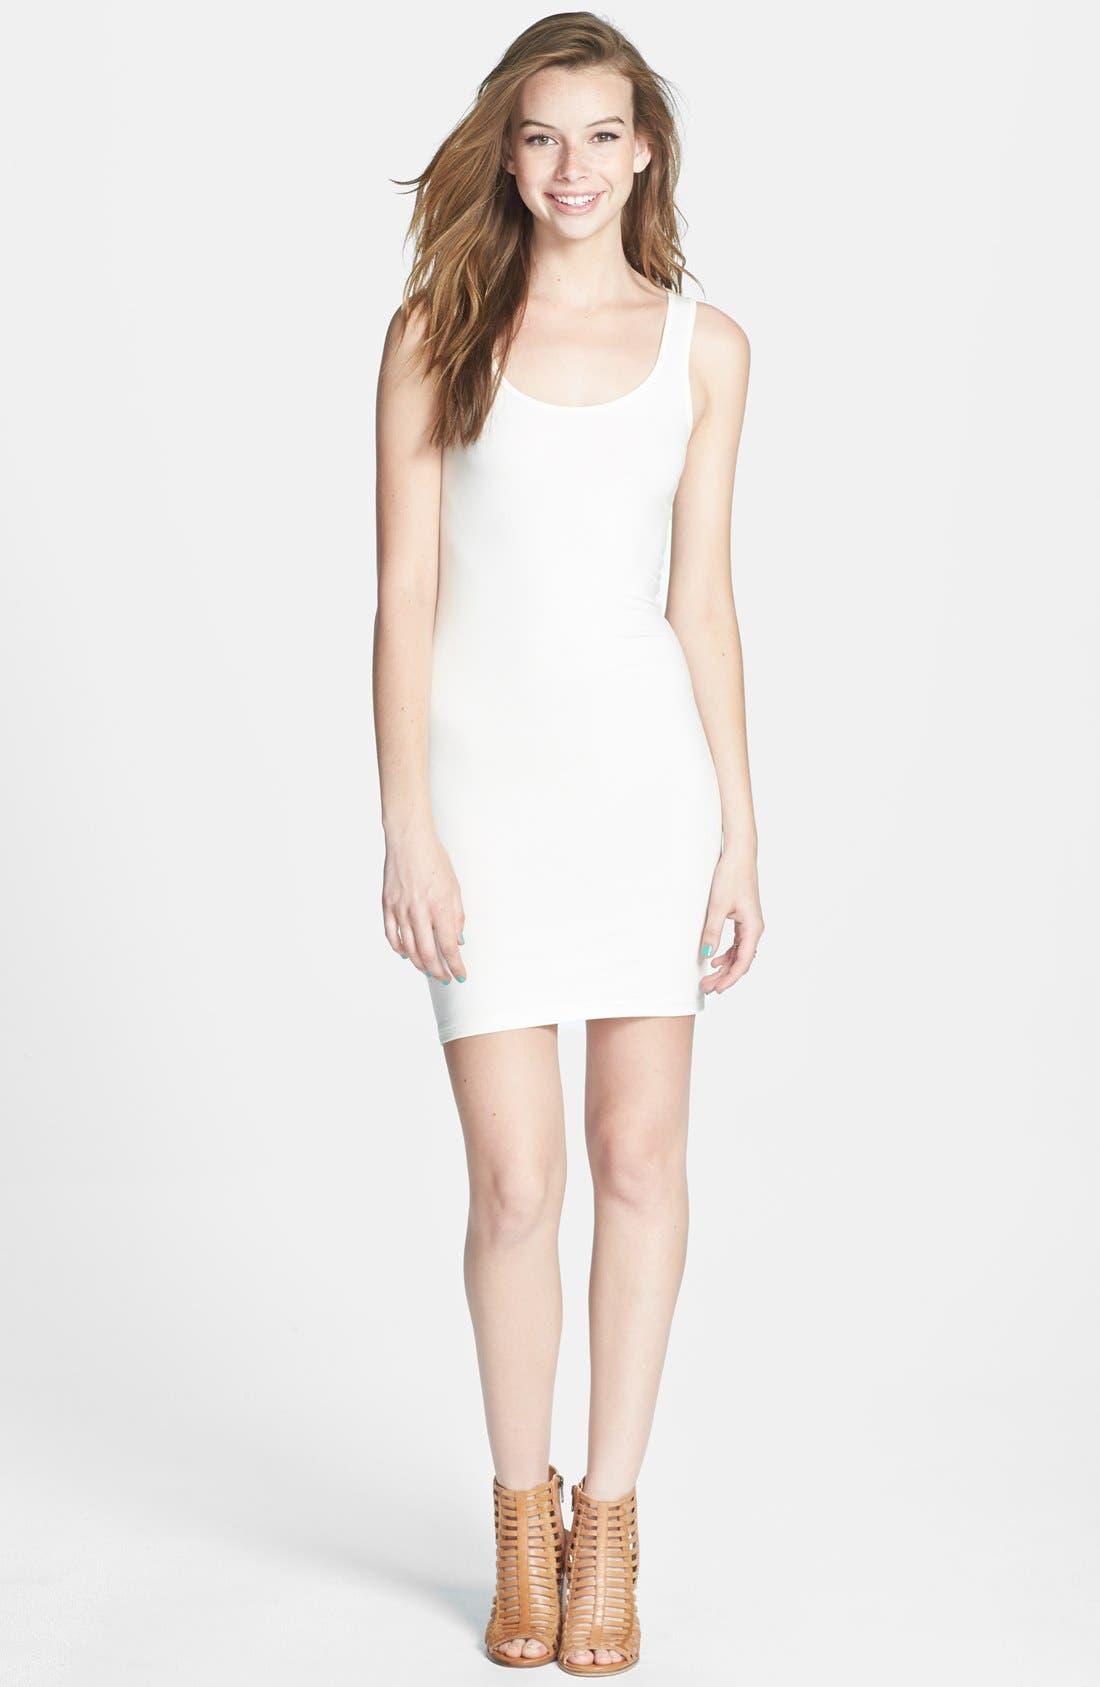 Alternate Image 1 Selected - BP. Double Scoop Tank Dress (Juniors) (Online Only)